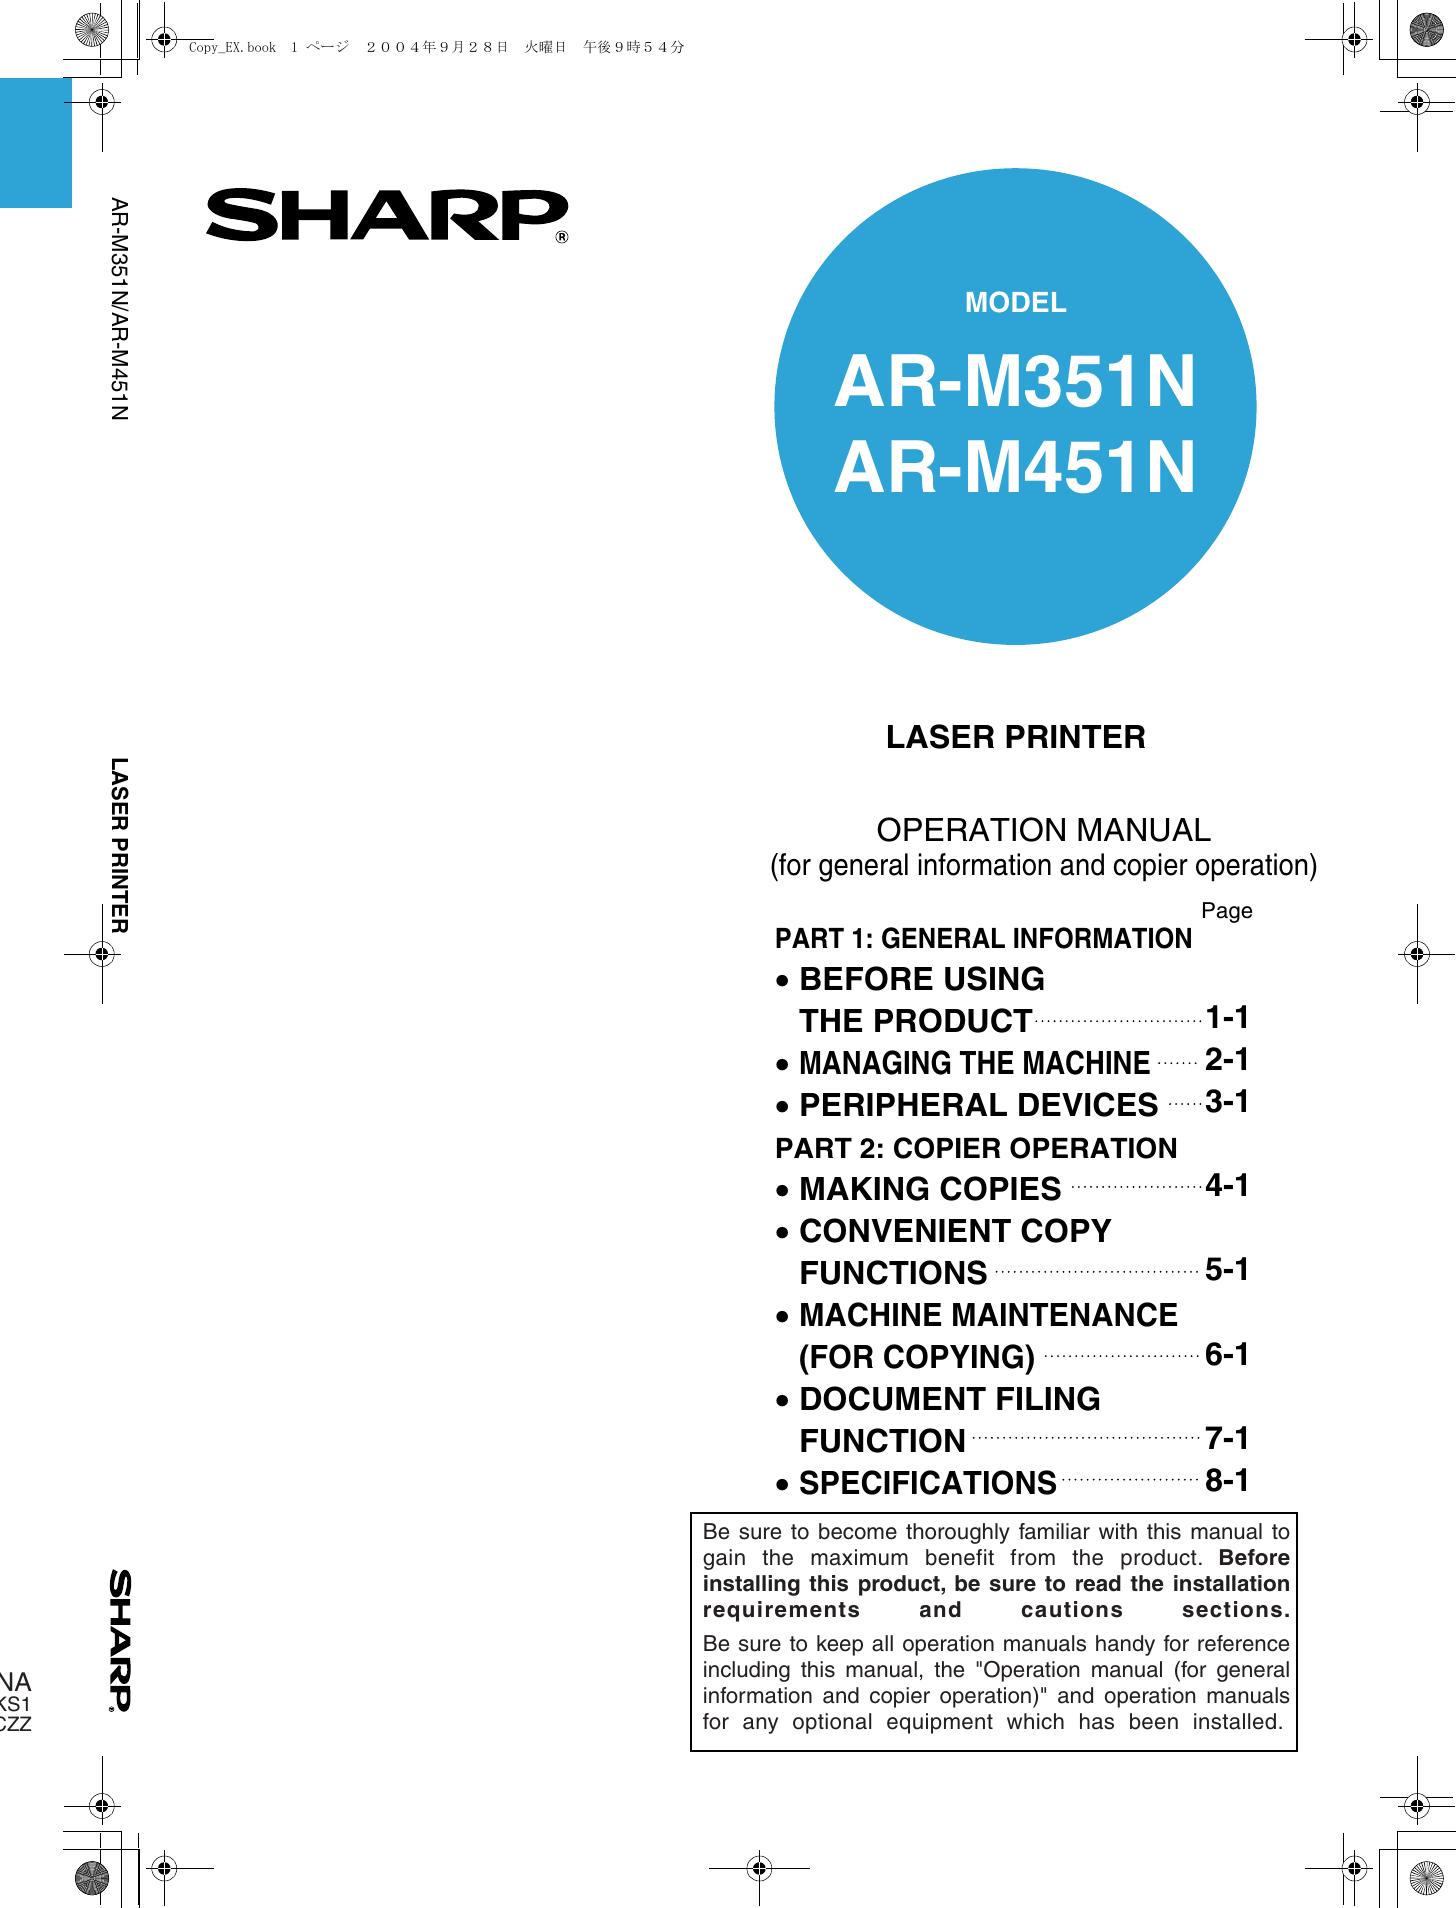 AR-M451N WINDOWS XP DRIVER